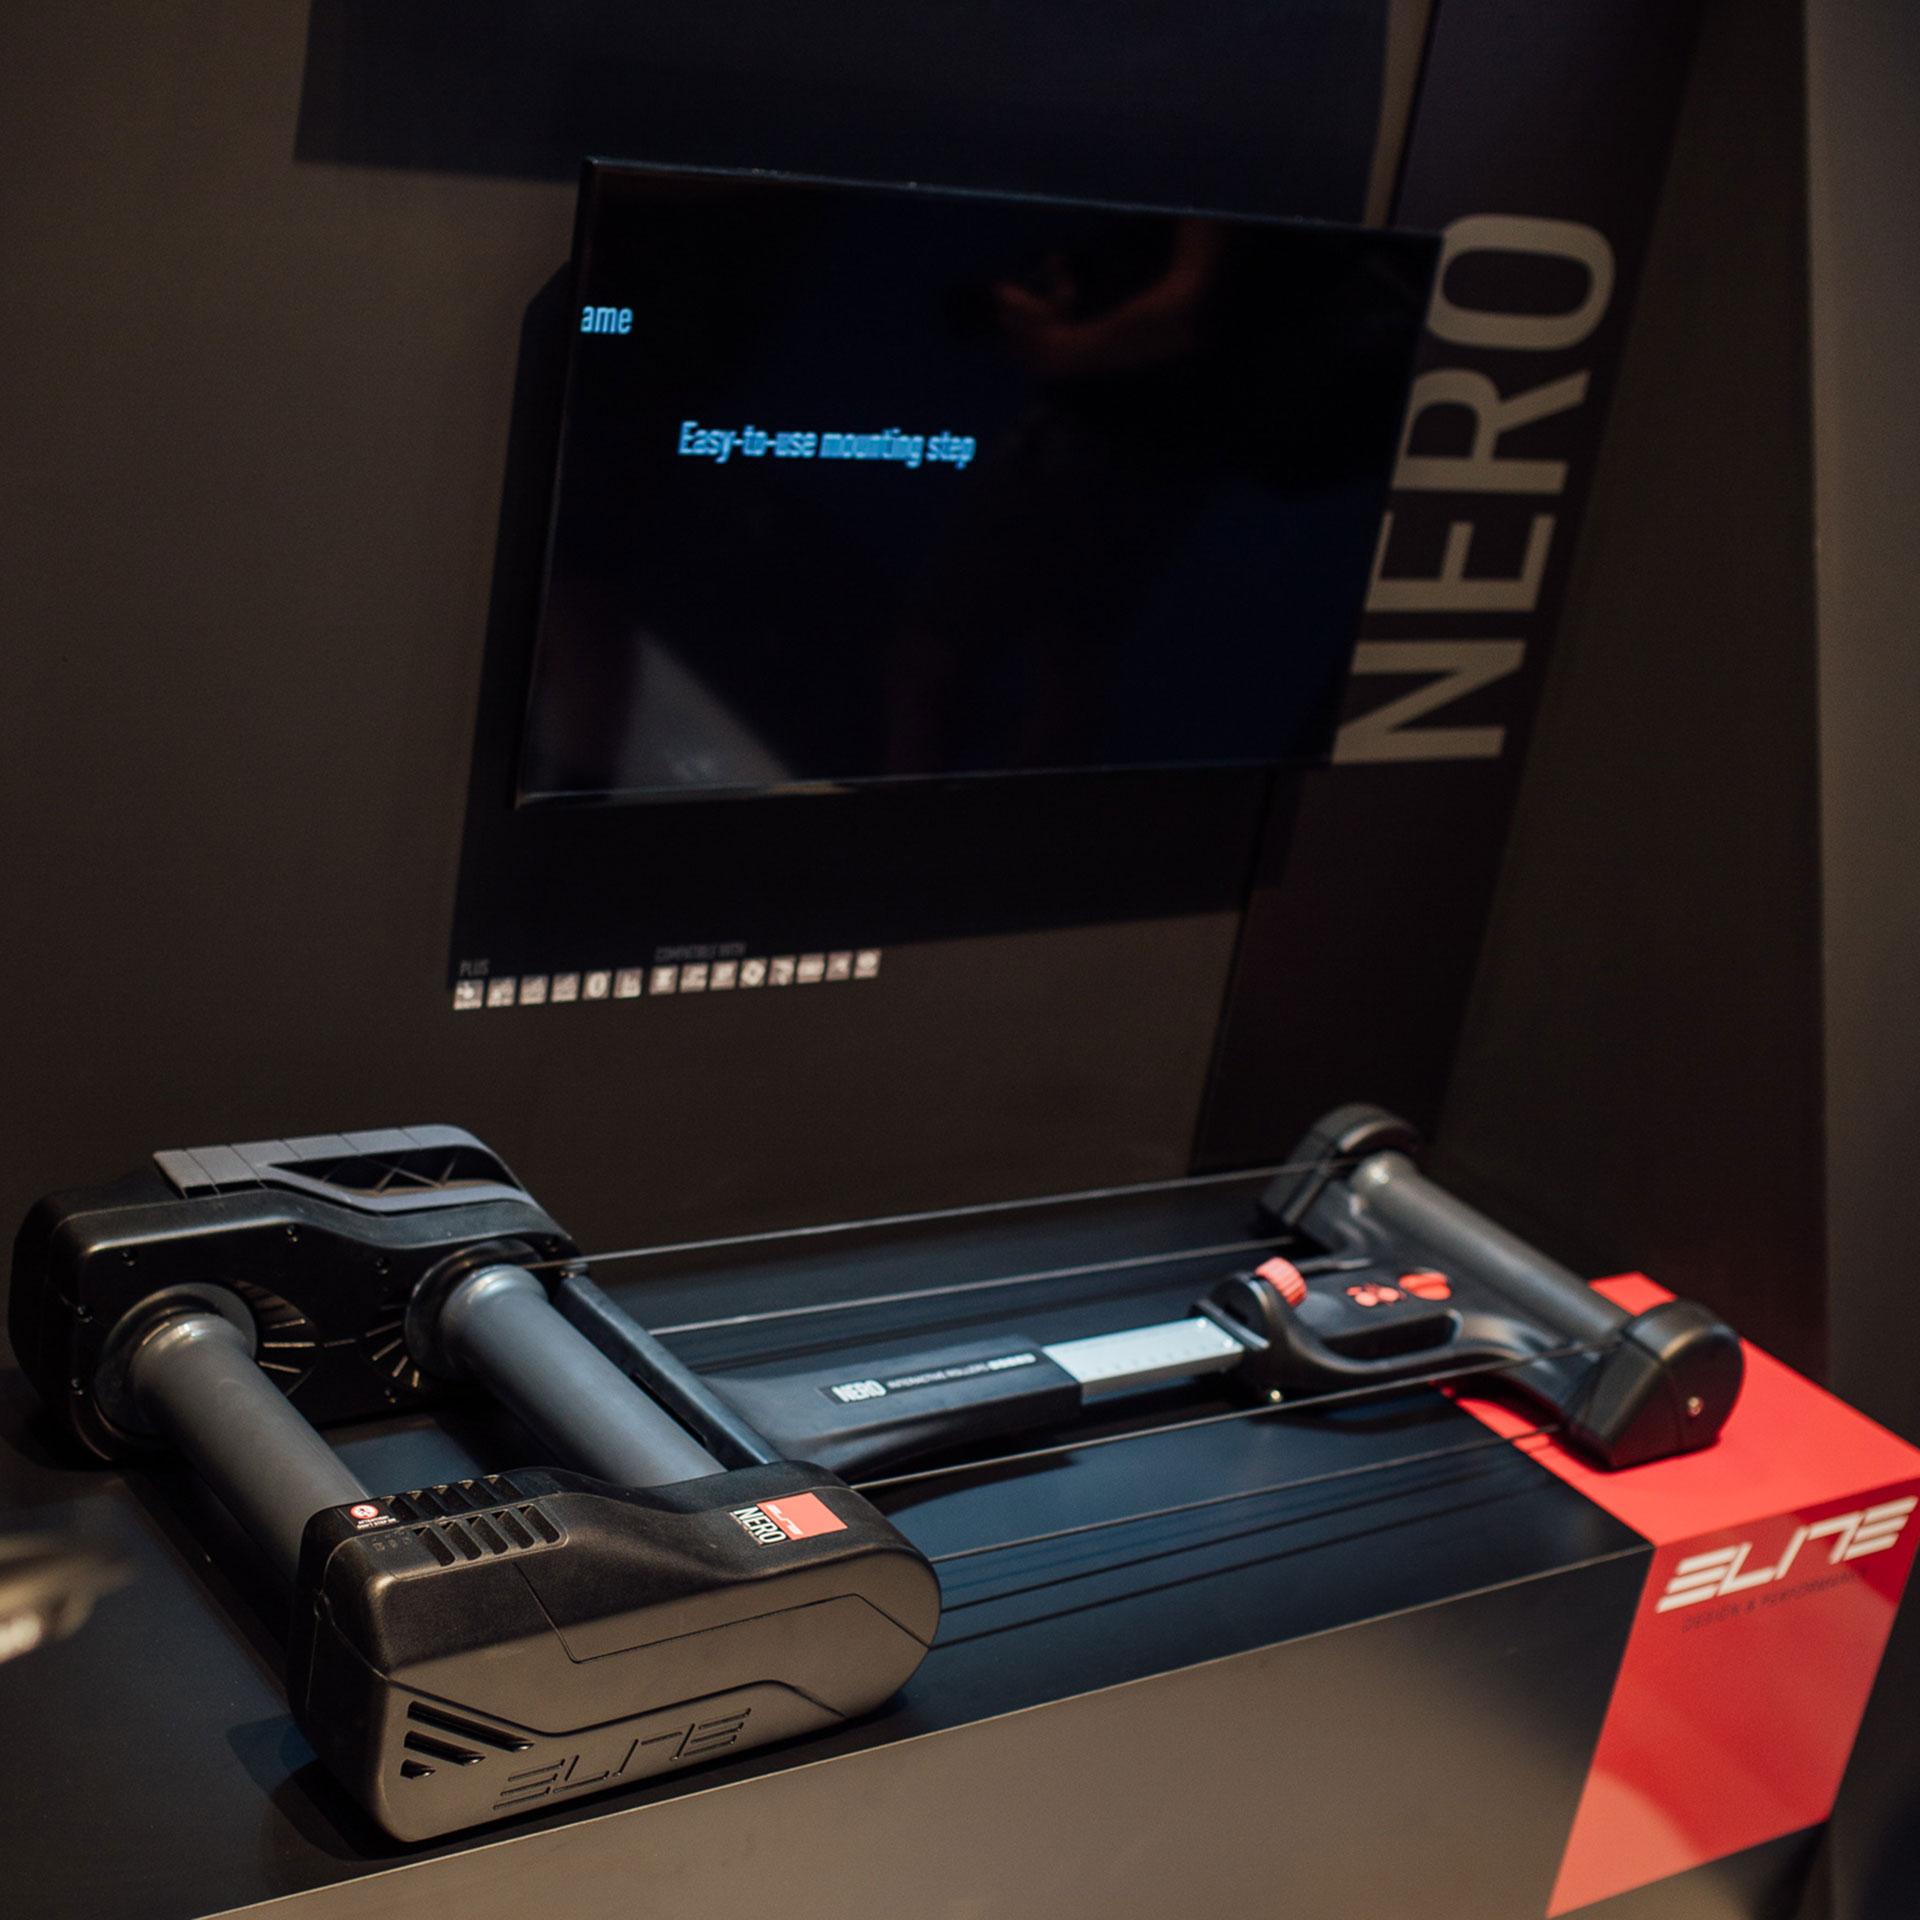 Elite Nero Interactive Rollers